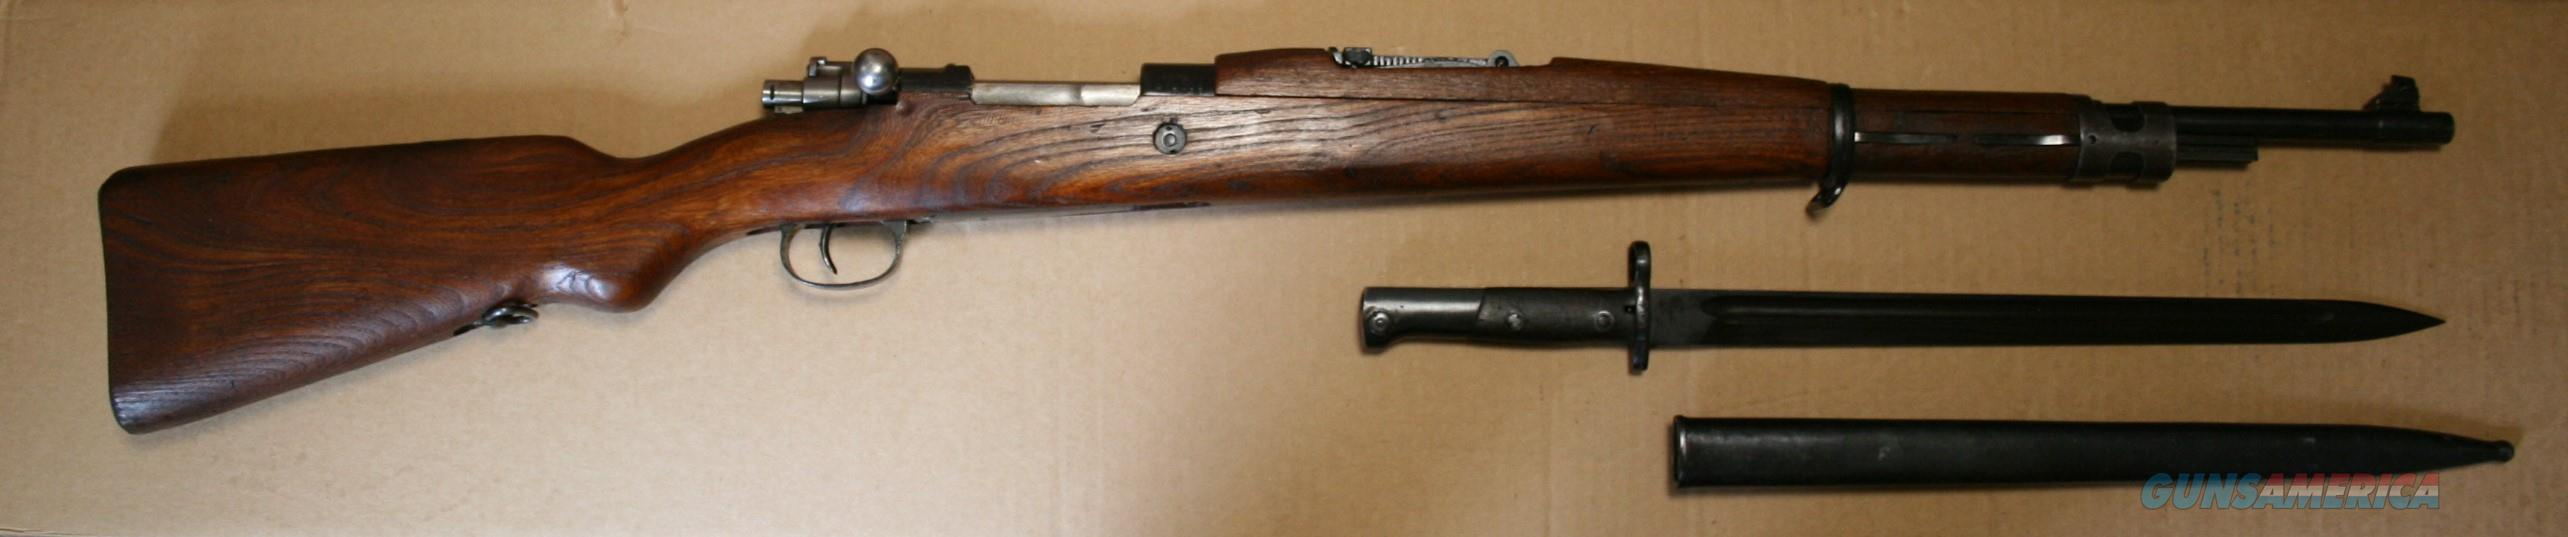 Yugoslavian M24/47 Mauser Straight Bolt Cal. 8 mm Rifle w/Bayonet  Guns > Rifles > Zastava Arms